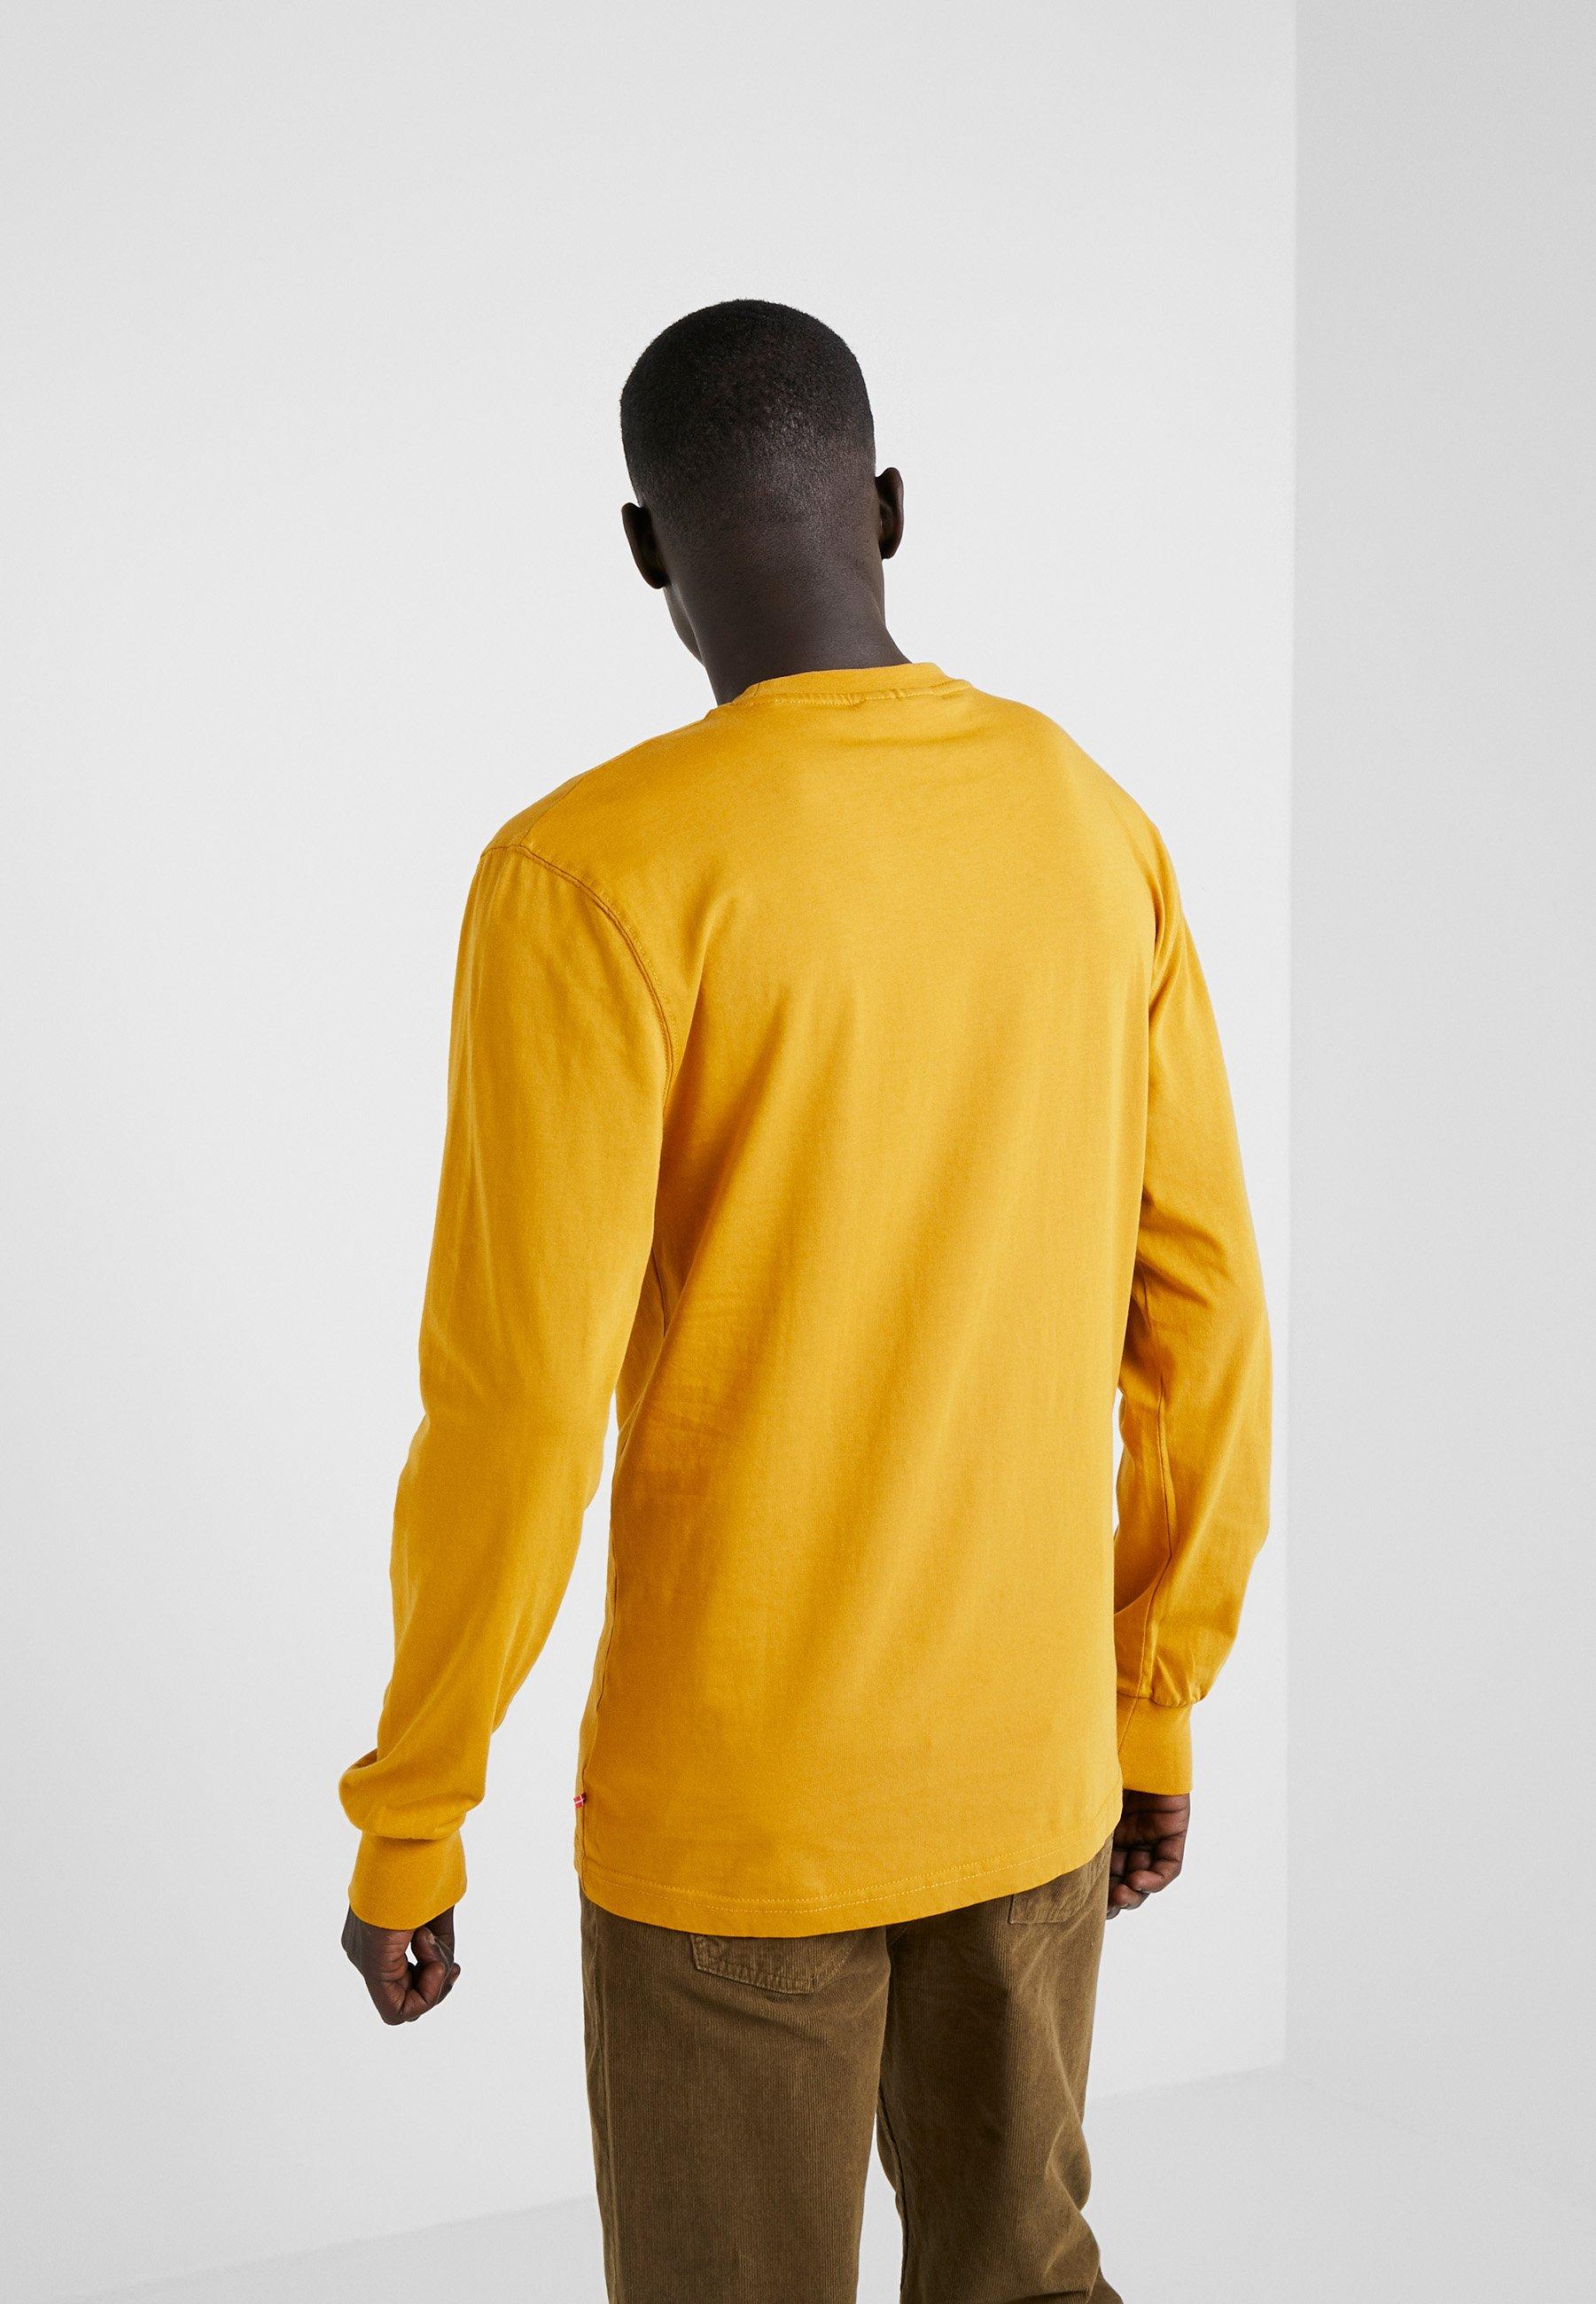 Mustard Tee Casual Kjobenhavn Manches Long À shirt Longues Han SleeveT ALq35R4j